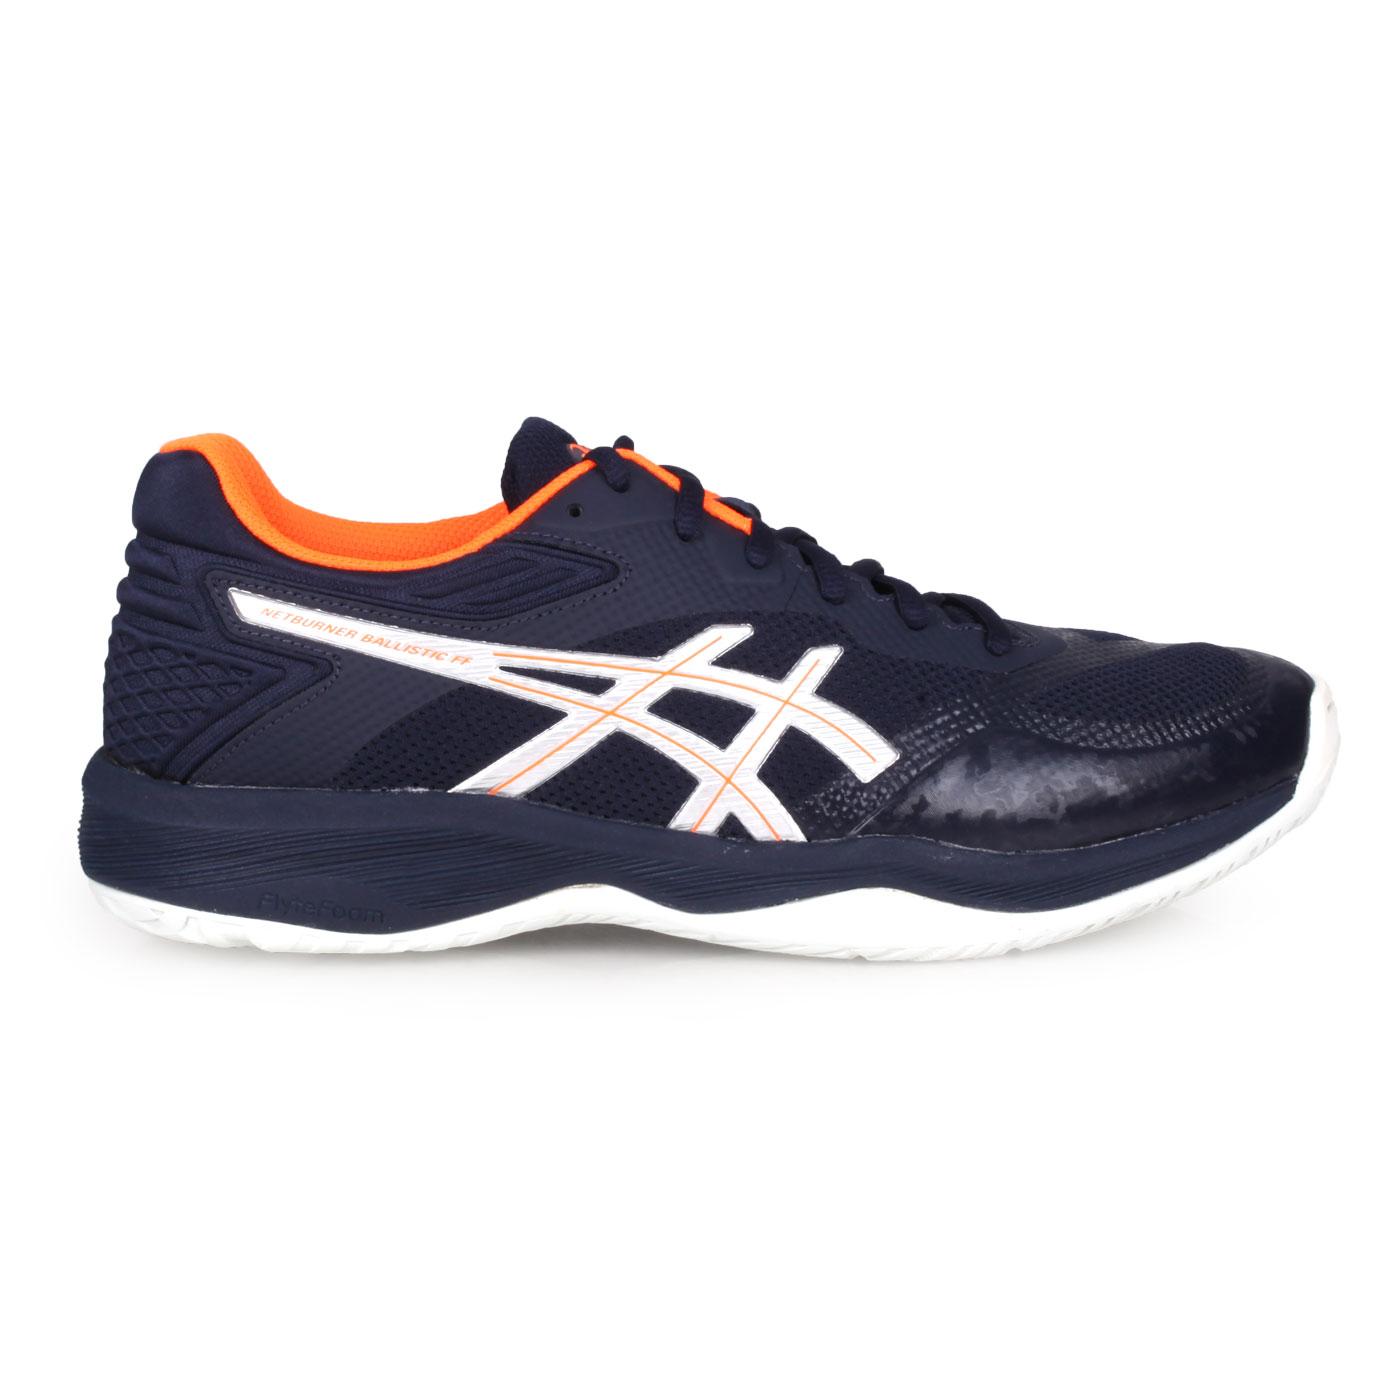 ASICS 排羽球鞋  @NETBURNER BALLISTIC FF@1051A002-100 - 丈青亮橘